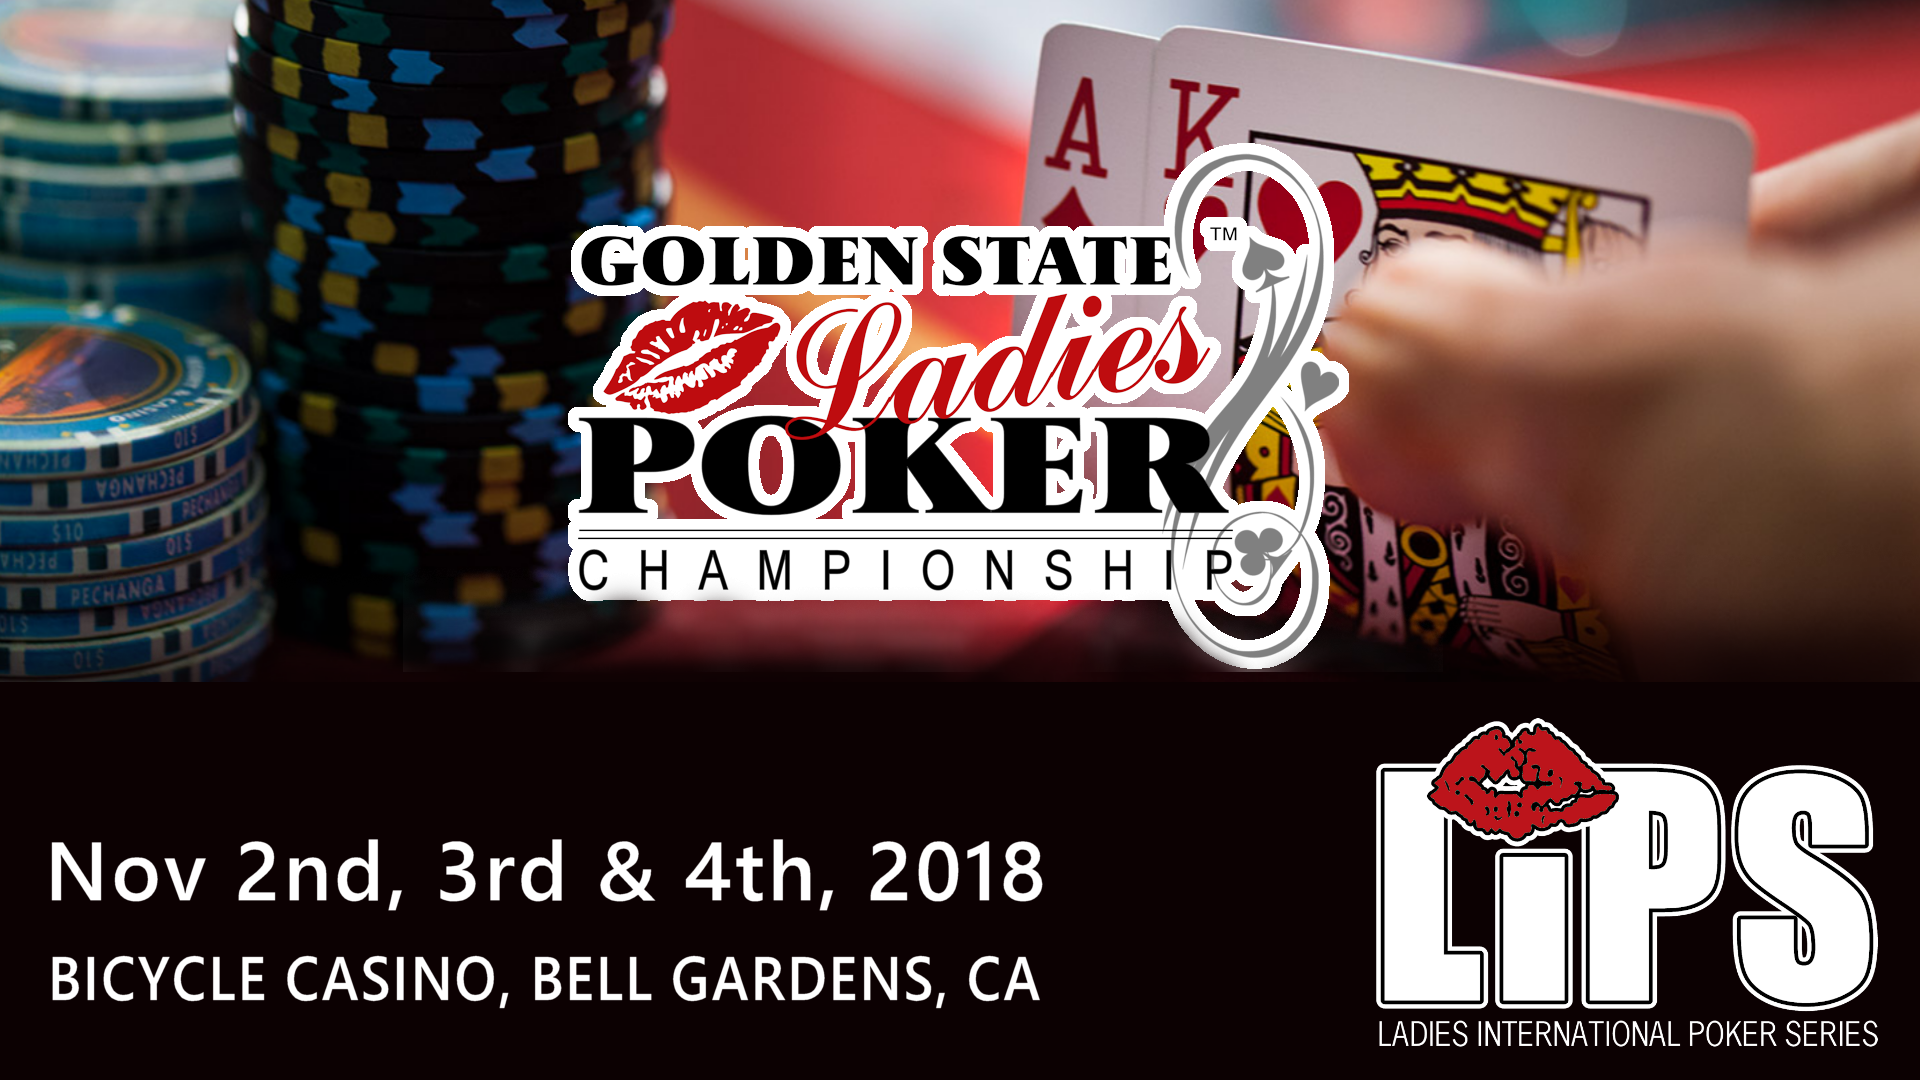 2018 Golden State Ladies Poker Championship